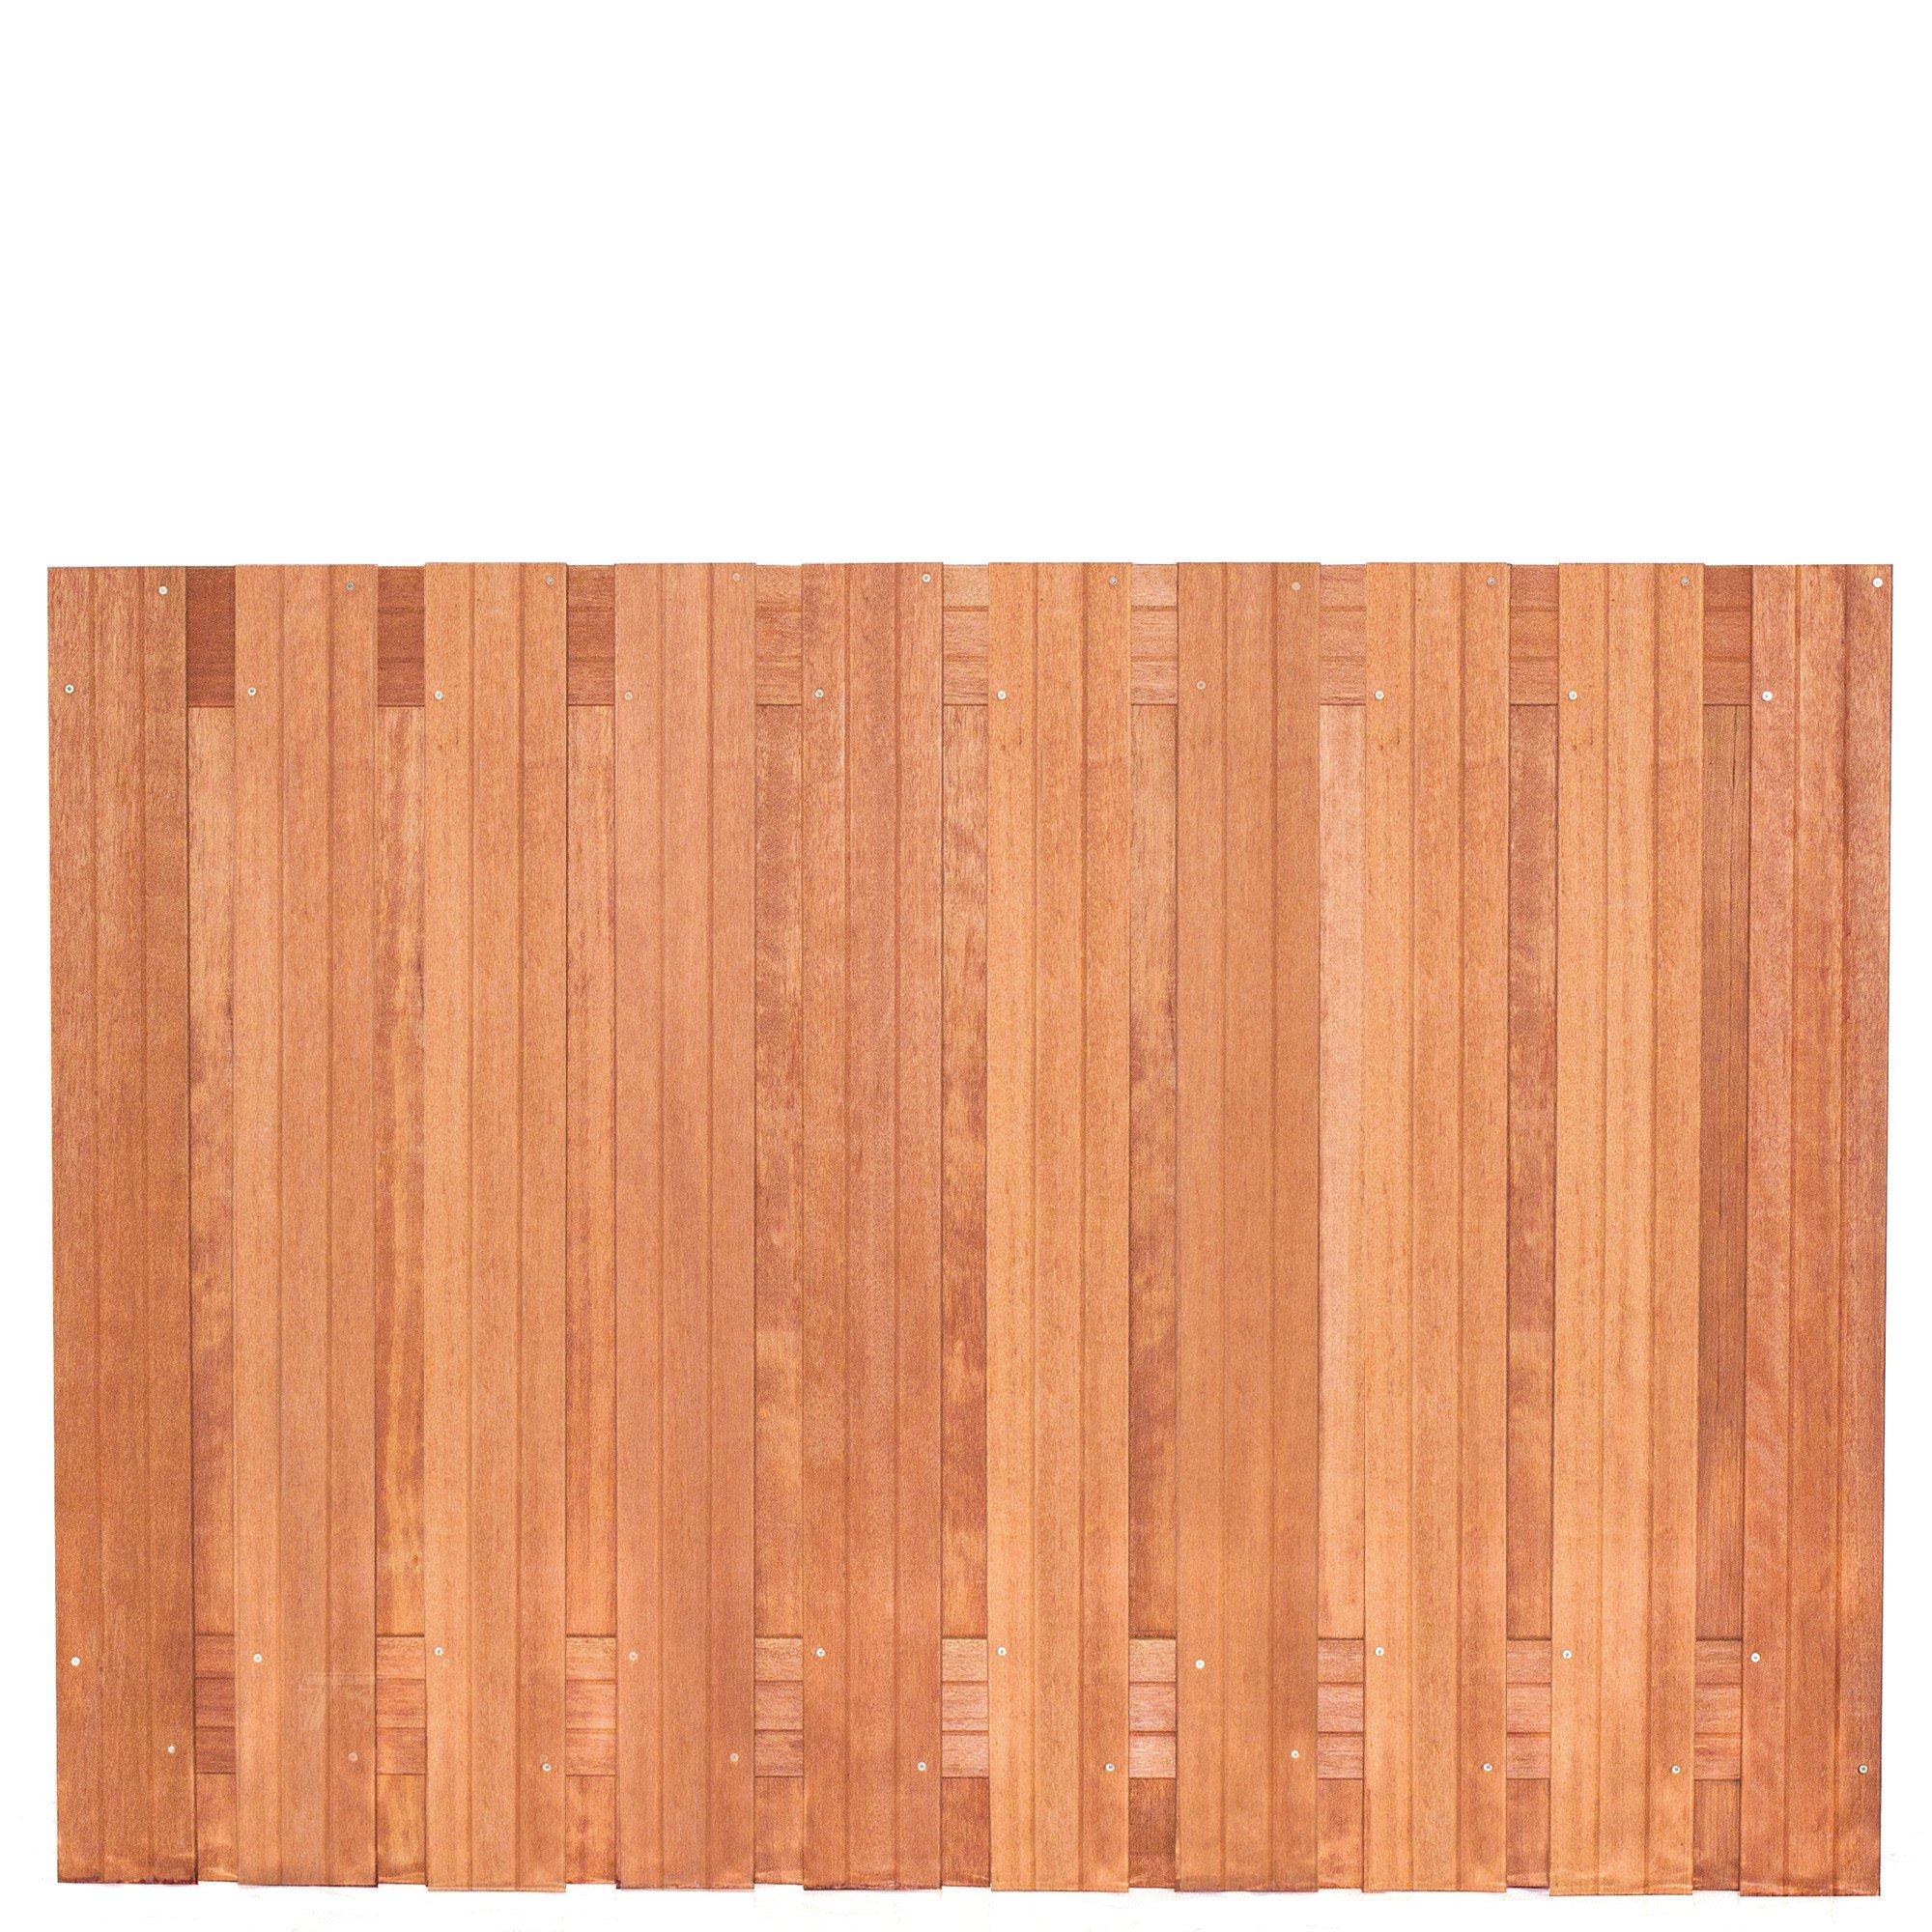 Hardhouten privacy schutting recht 130 x 180 cm. Type: Dronten 130